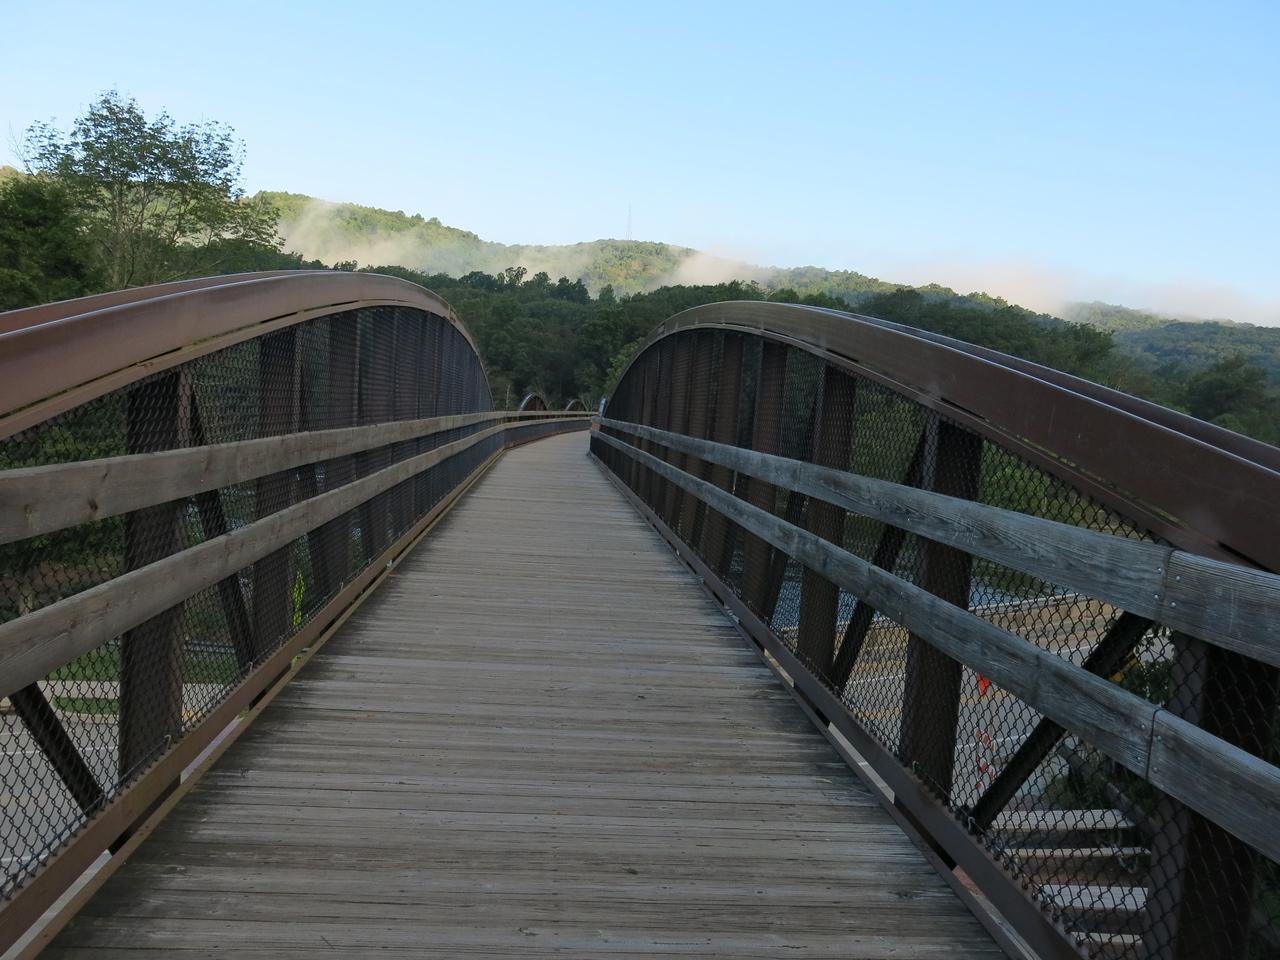 Low Bridge at Ohiopyle